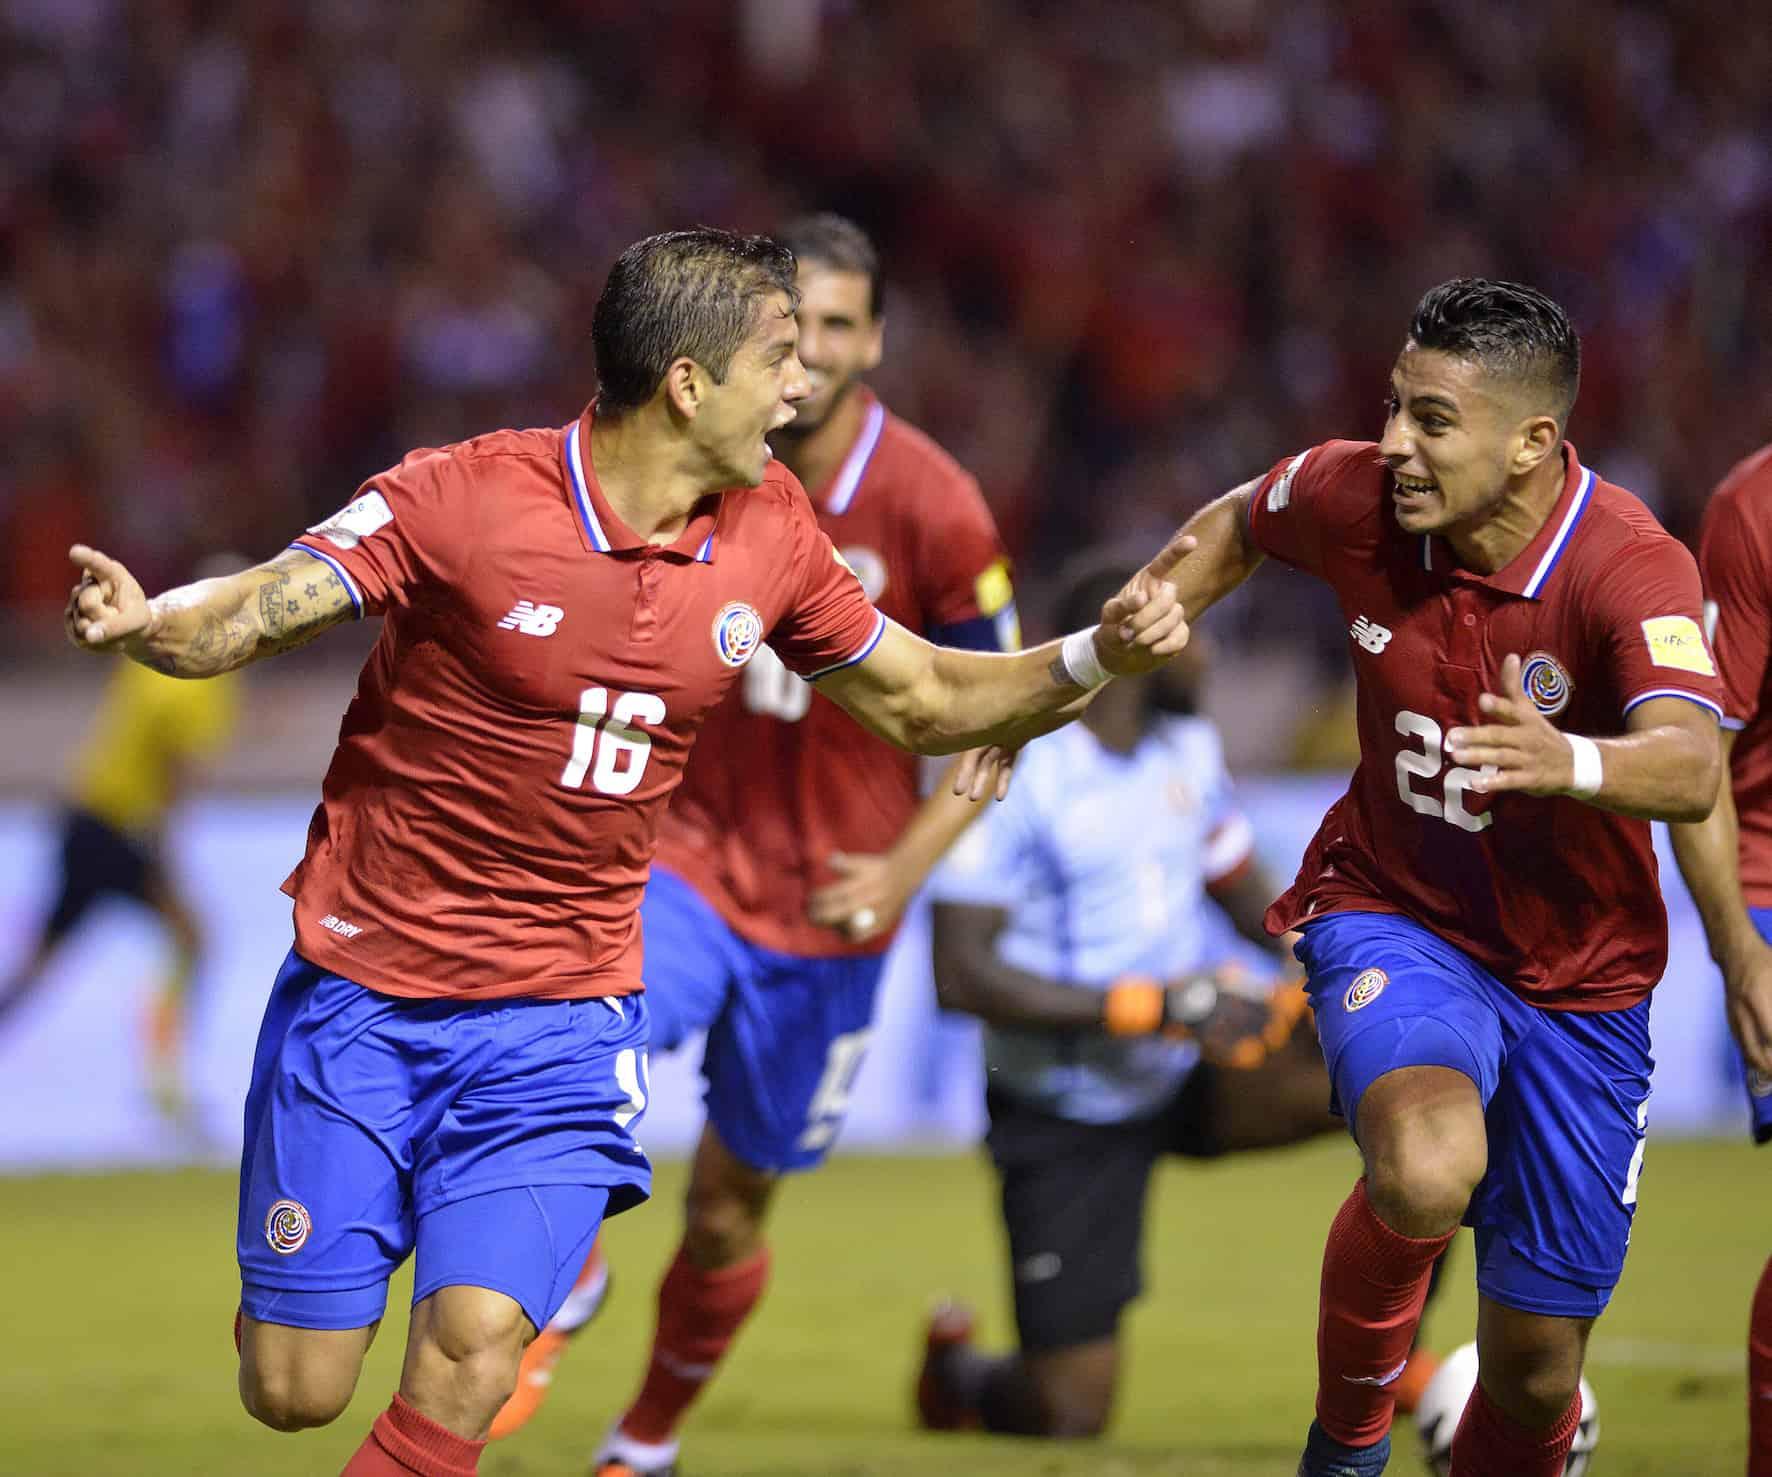 Costa Rica football players Cristian Gamboa and Ronald Matarrita